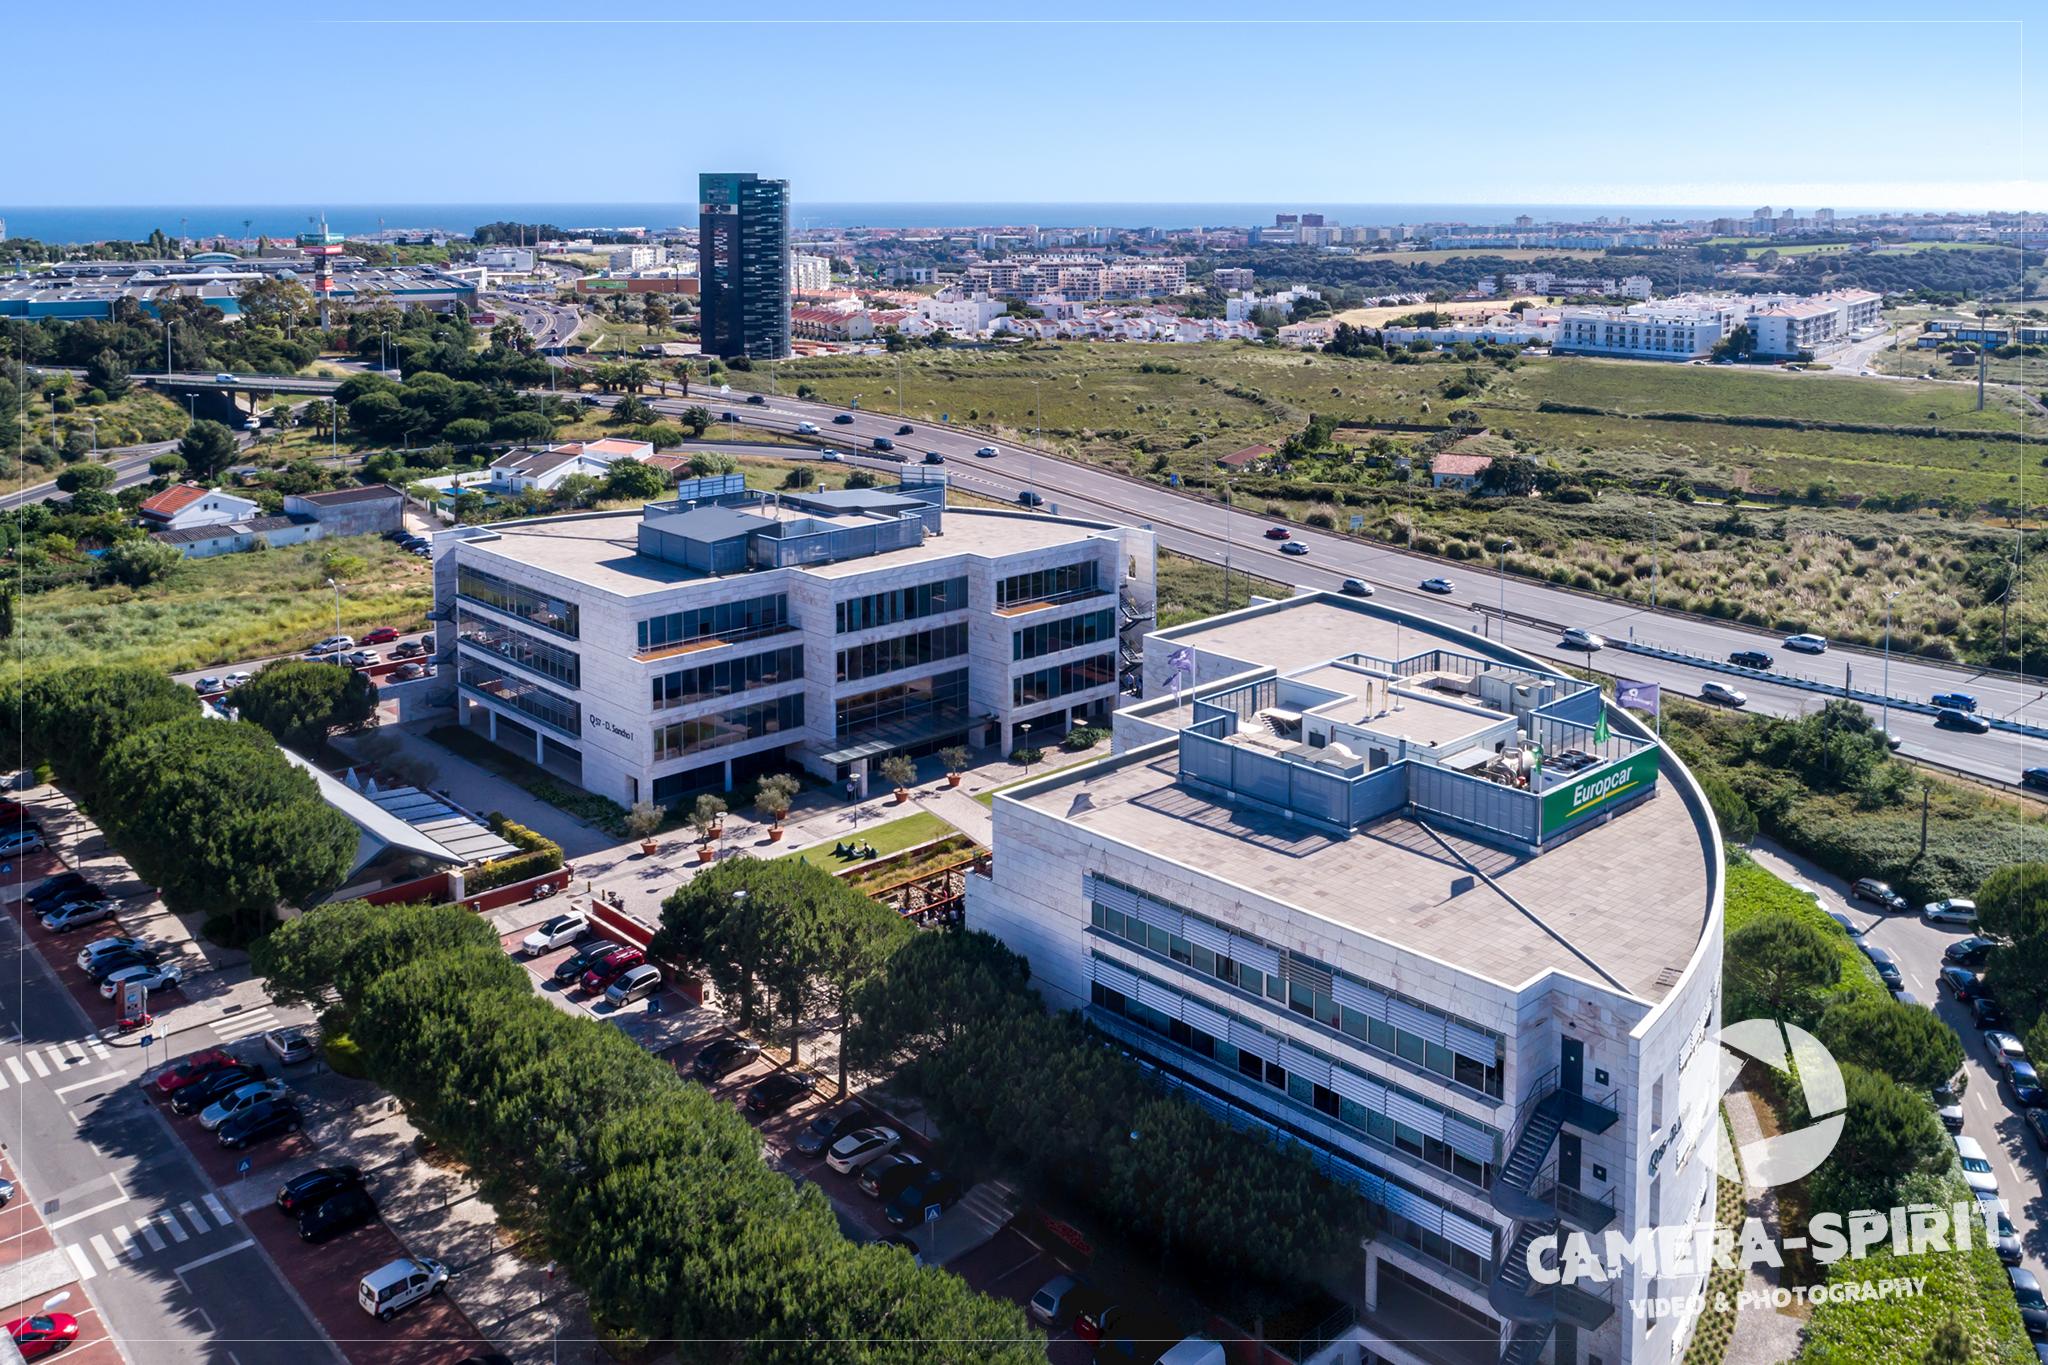 AerialPhotography_Proj011_Photos03_PedroLima